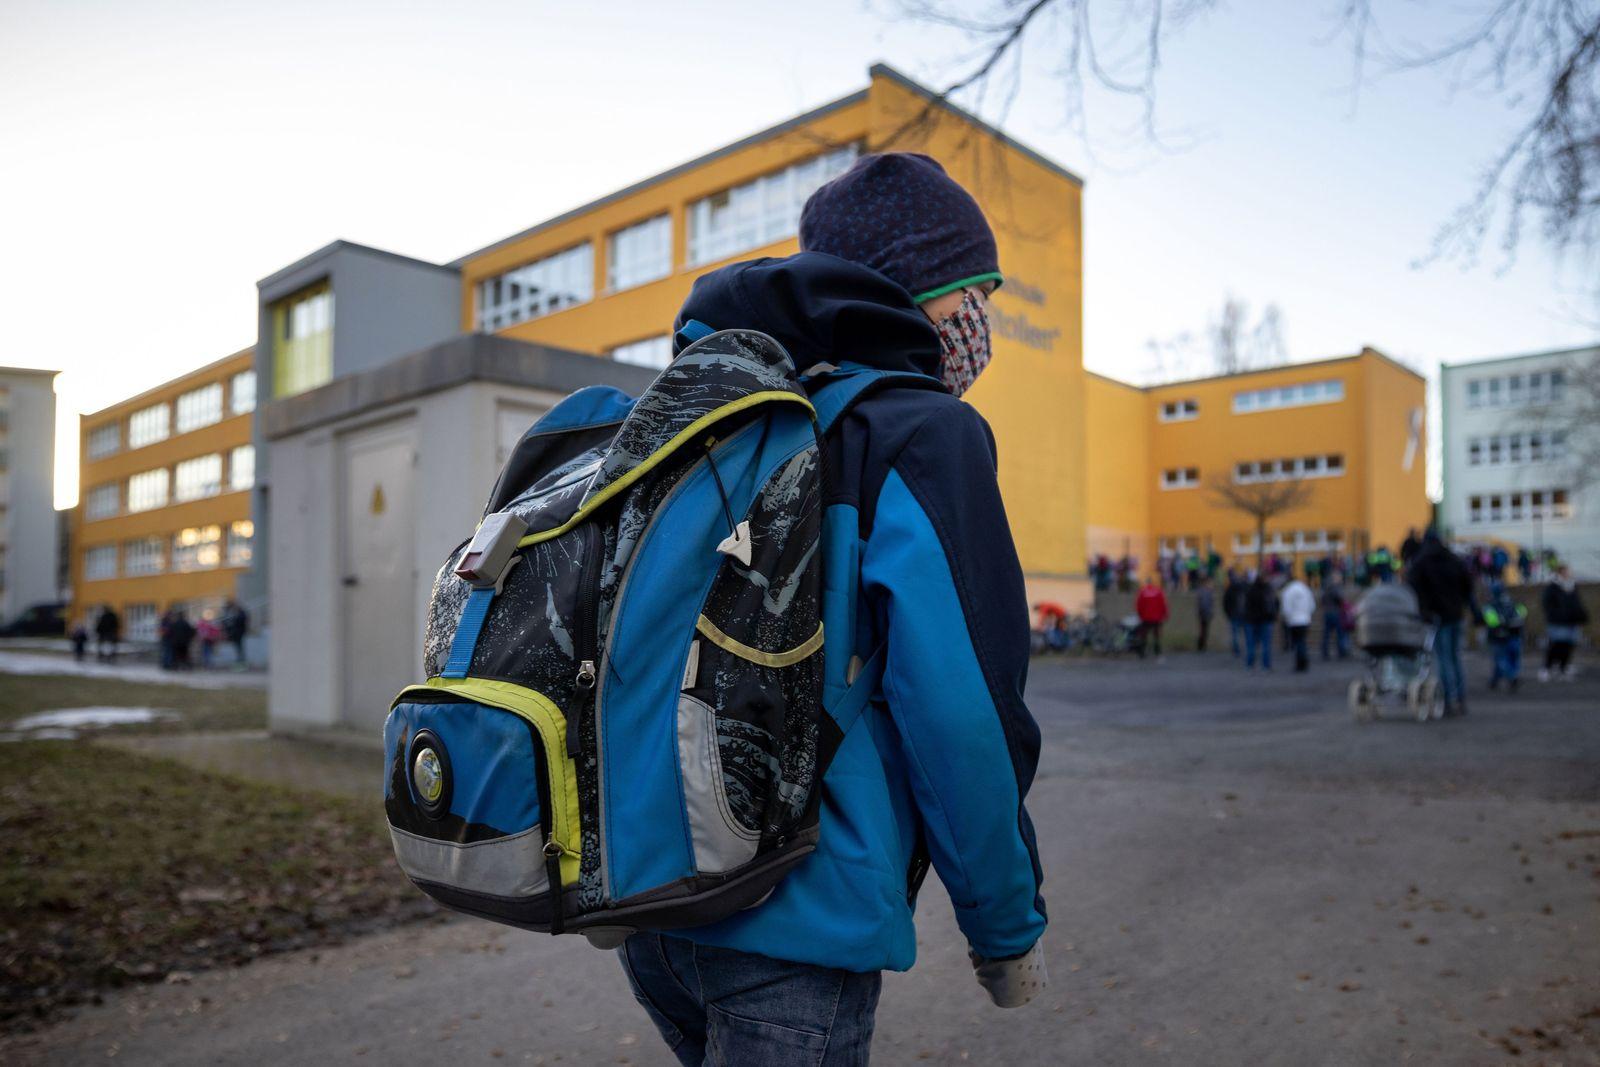 Coronavirus - Schulen in Thüringen öffnen wieder